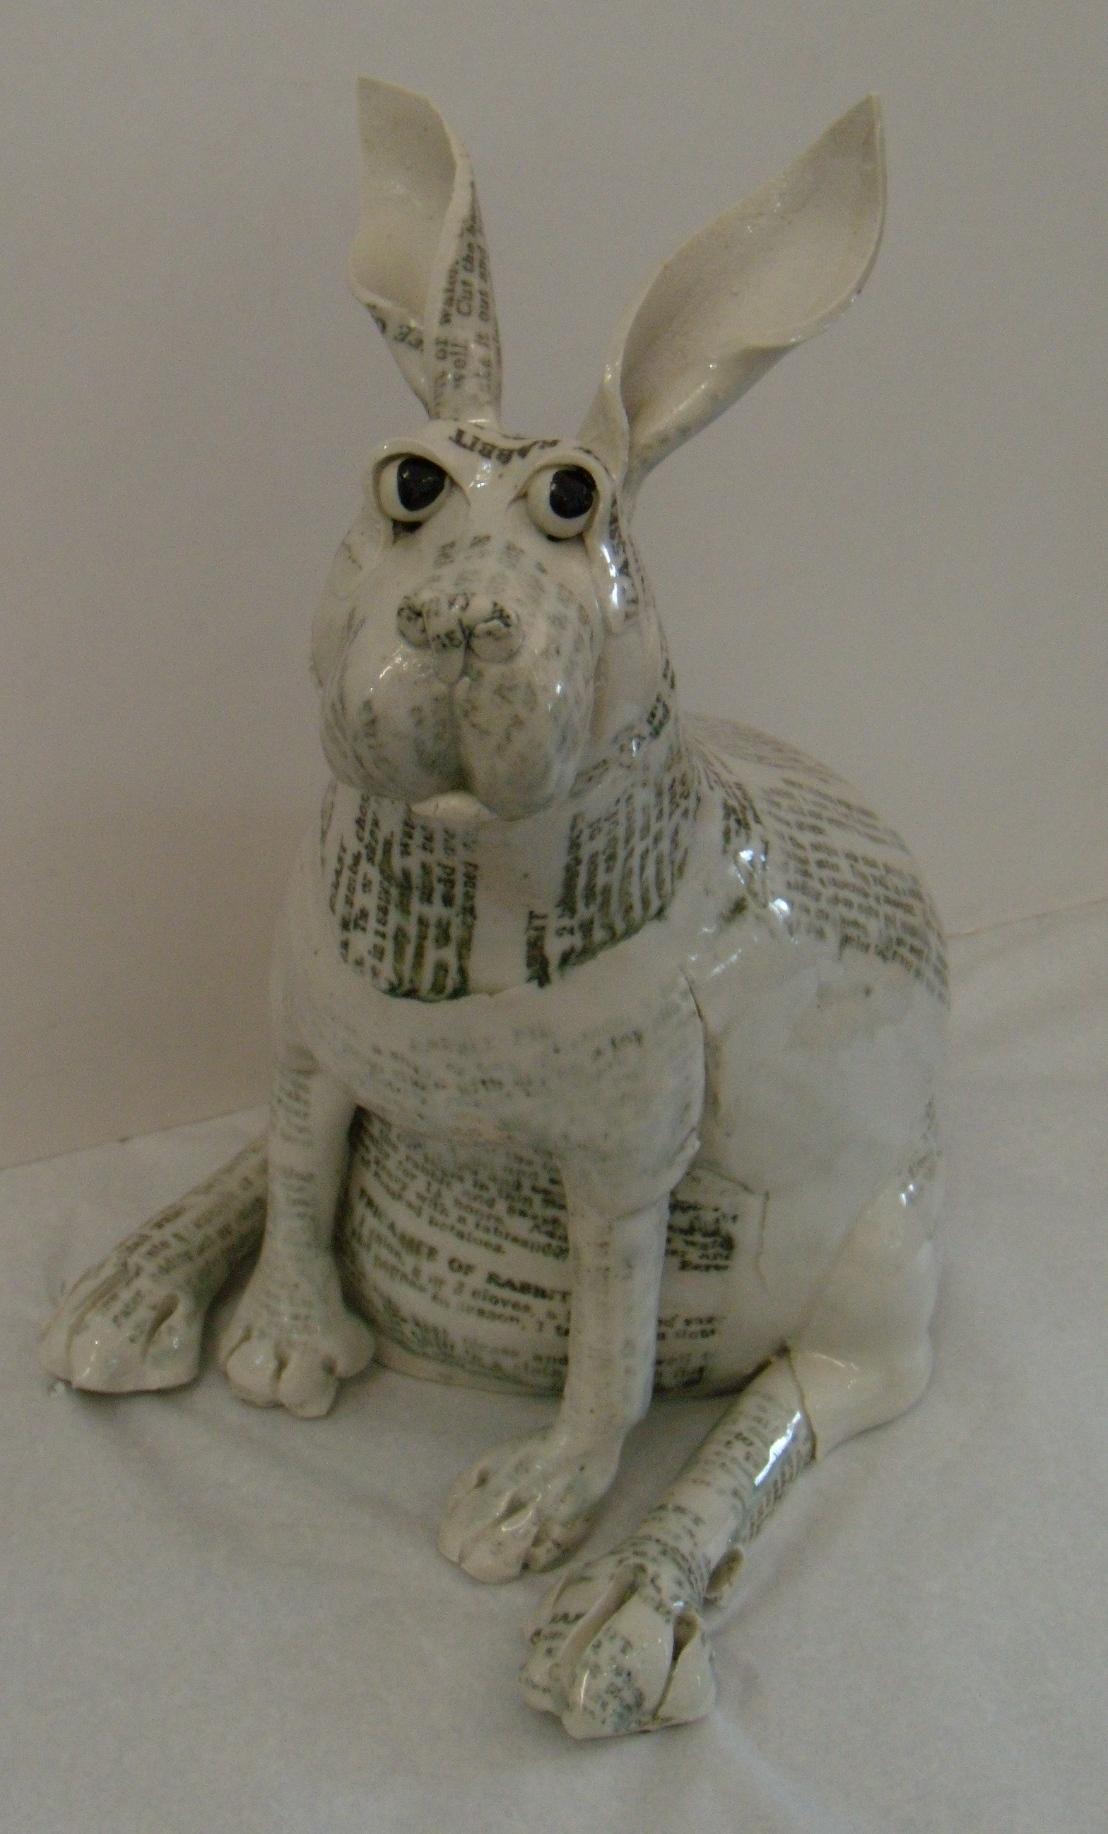 Medium Printed Rabbit $260 Measures approx 300 mm w x 330 mm h